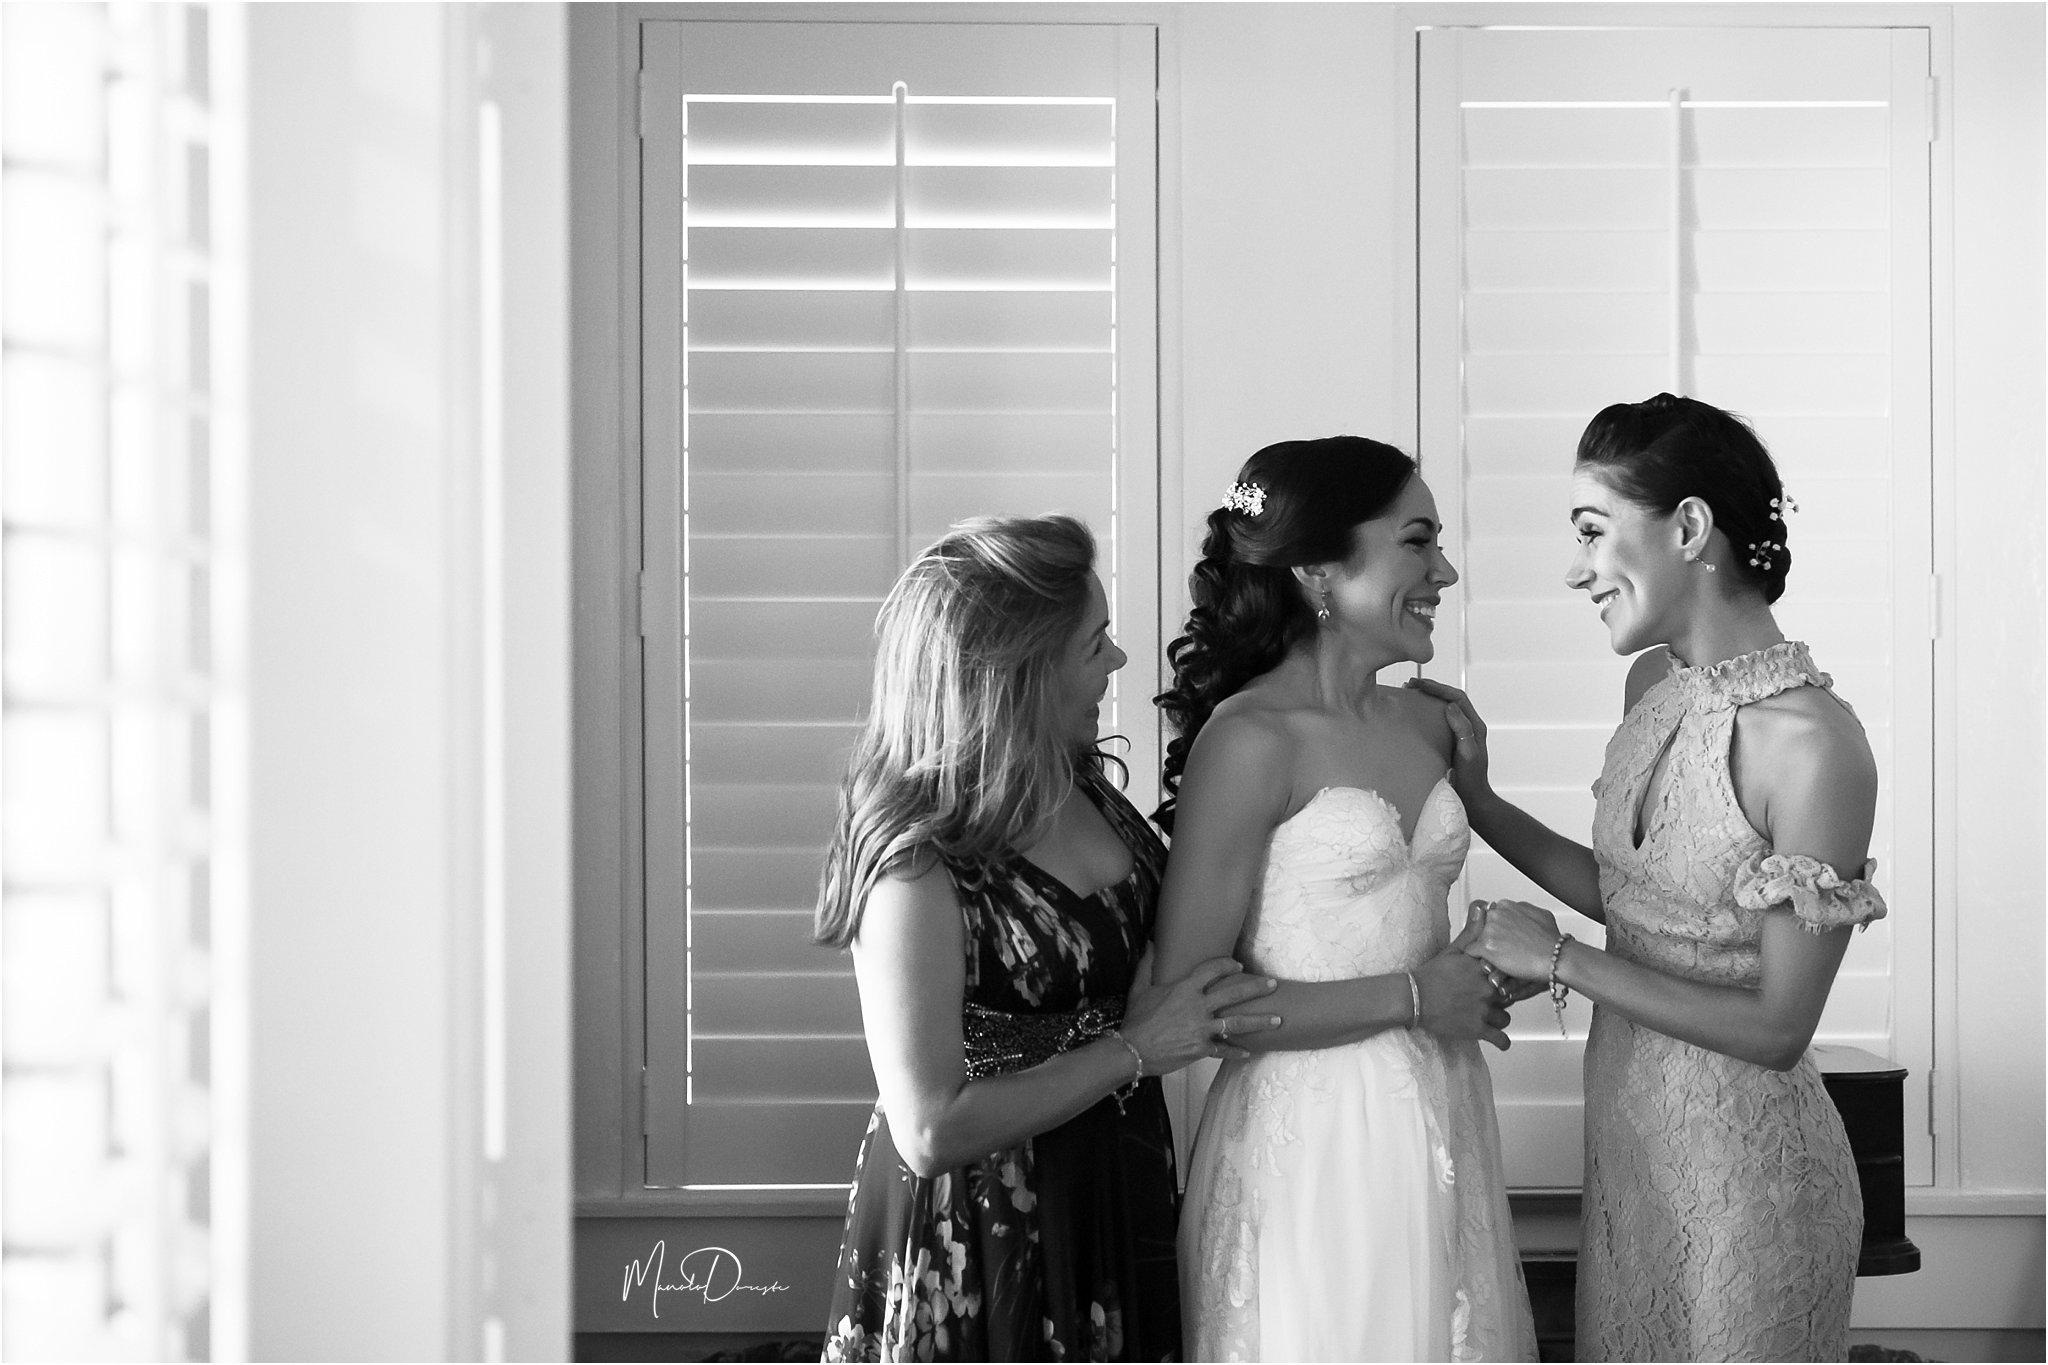 0497_ManoloDoreste_InFocusStudios_Wedding_Family_Photography_Miami_MiamiPhotographer.jpg